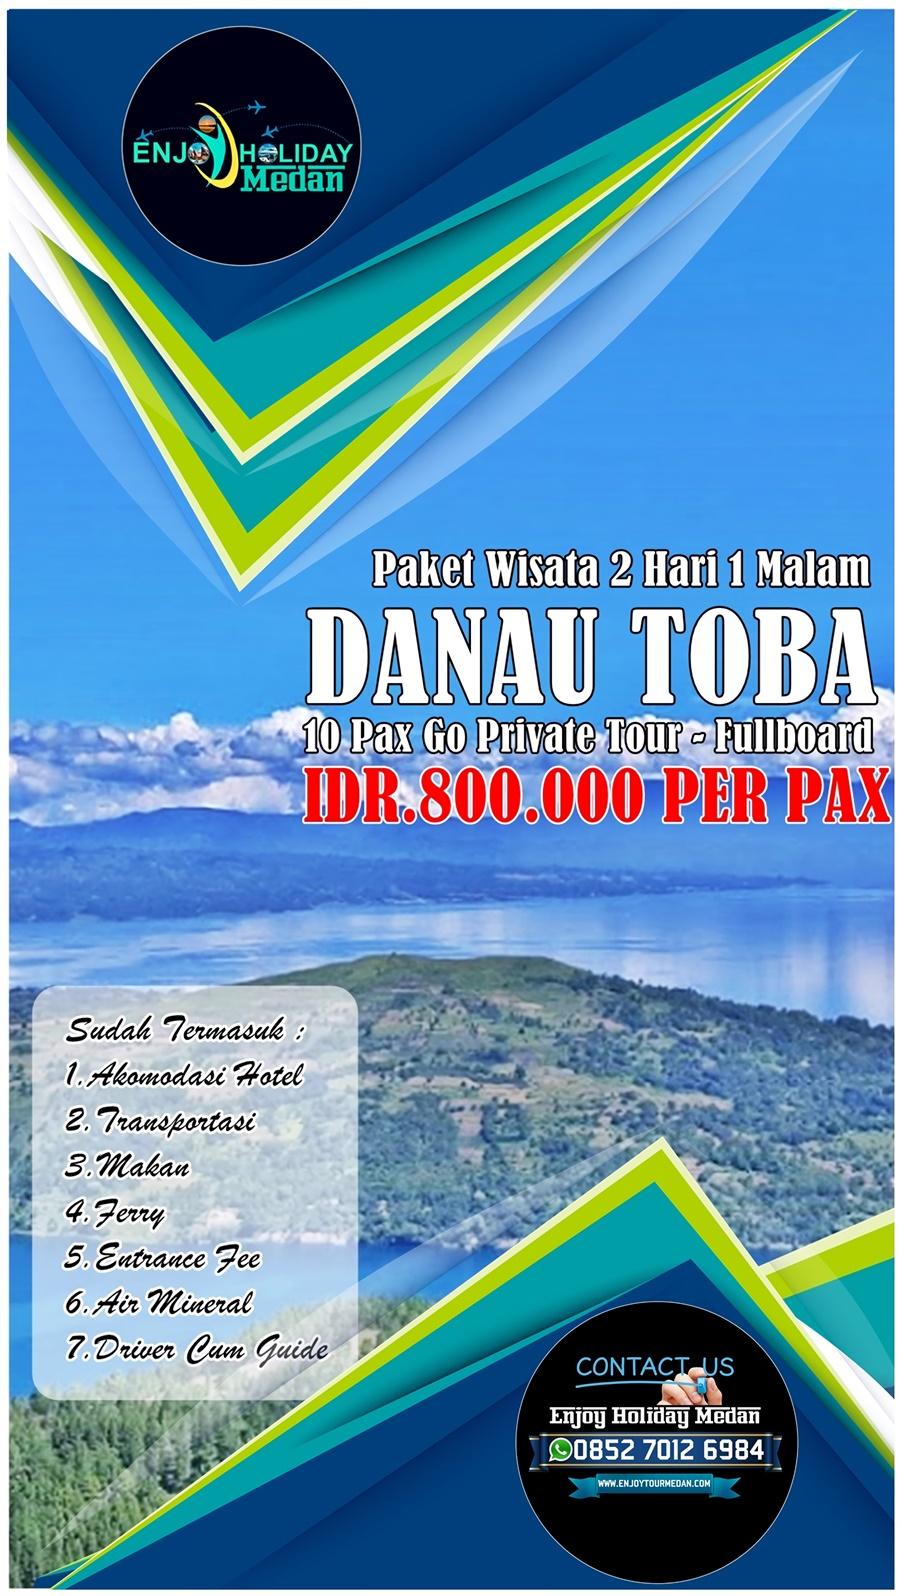 Paket Outbound Medan Danau Toba